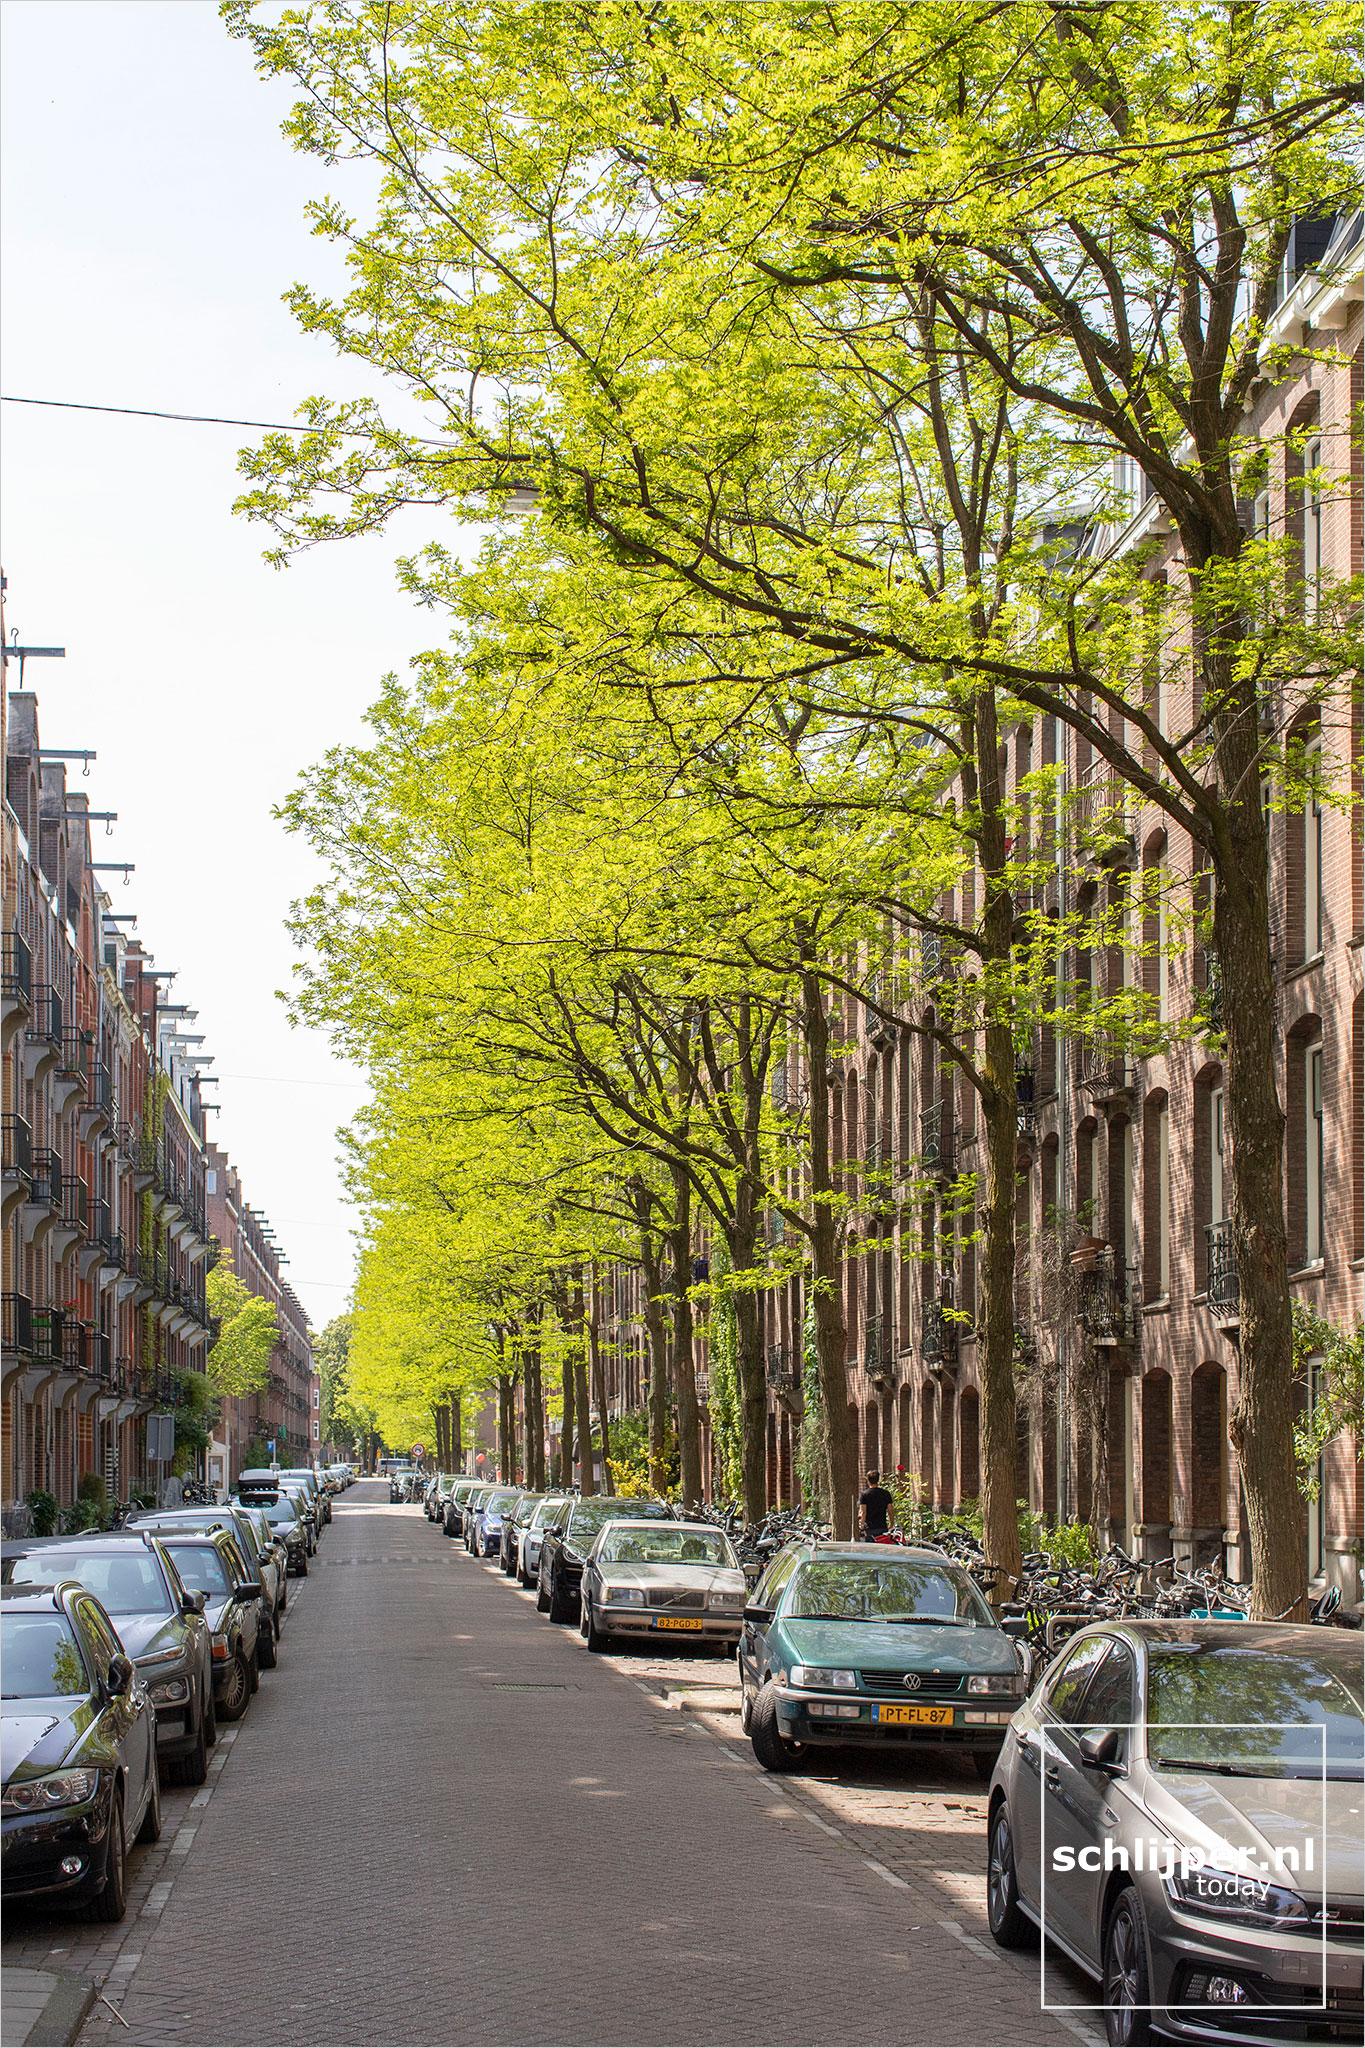 Nederland, Amsterdam, 8 mei 2020